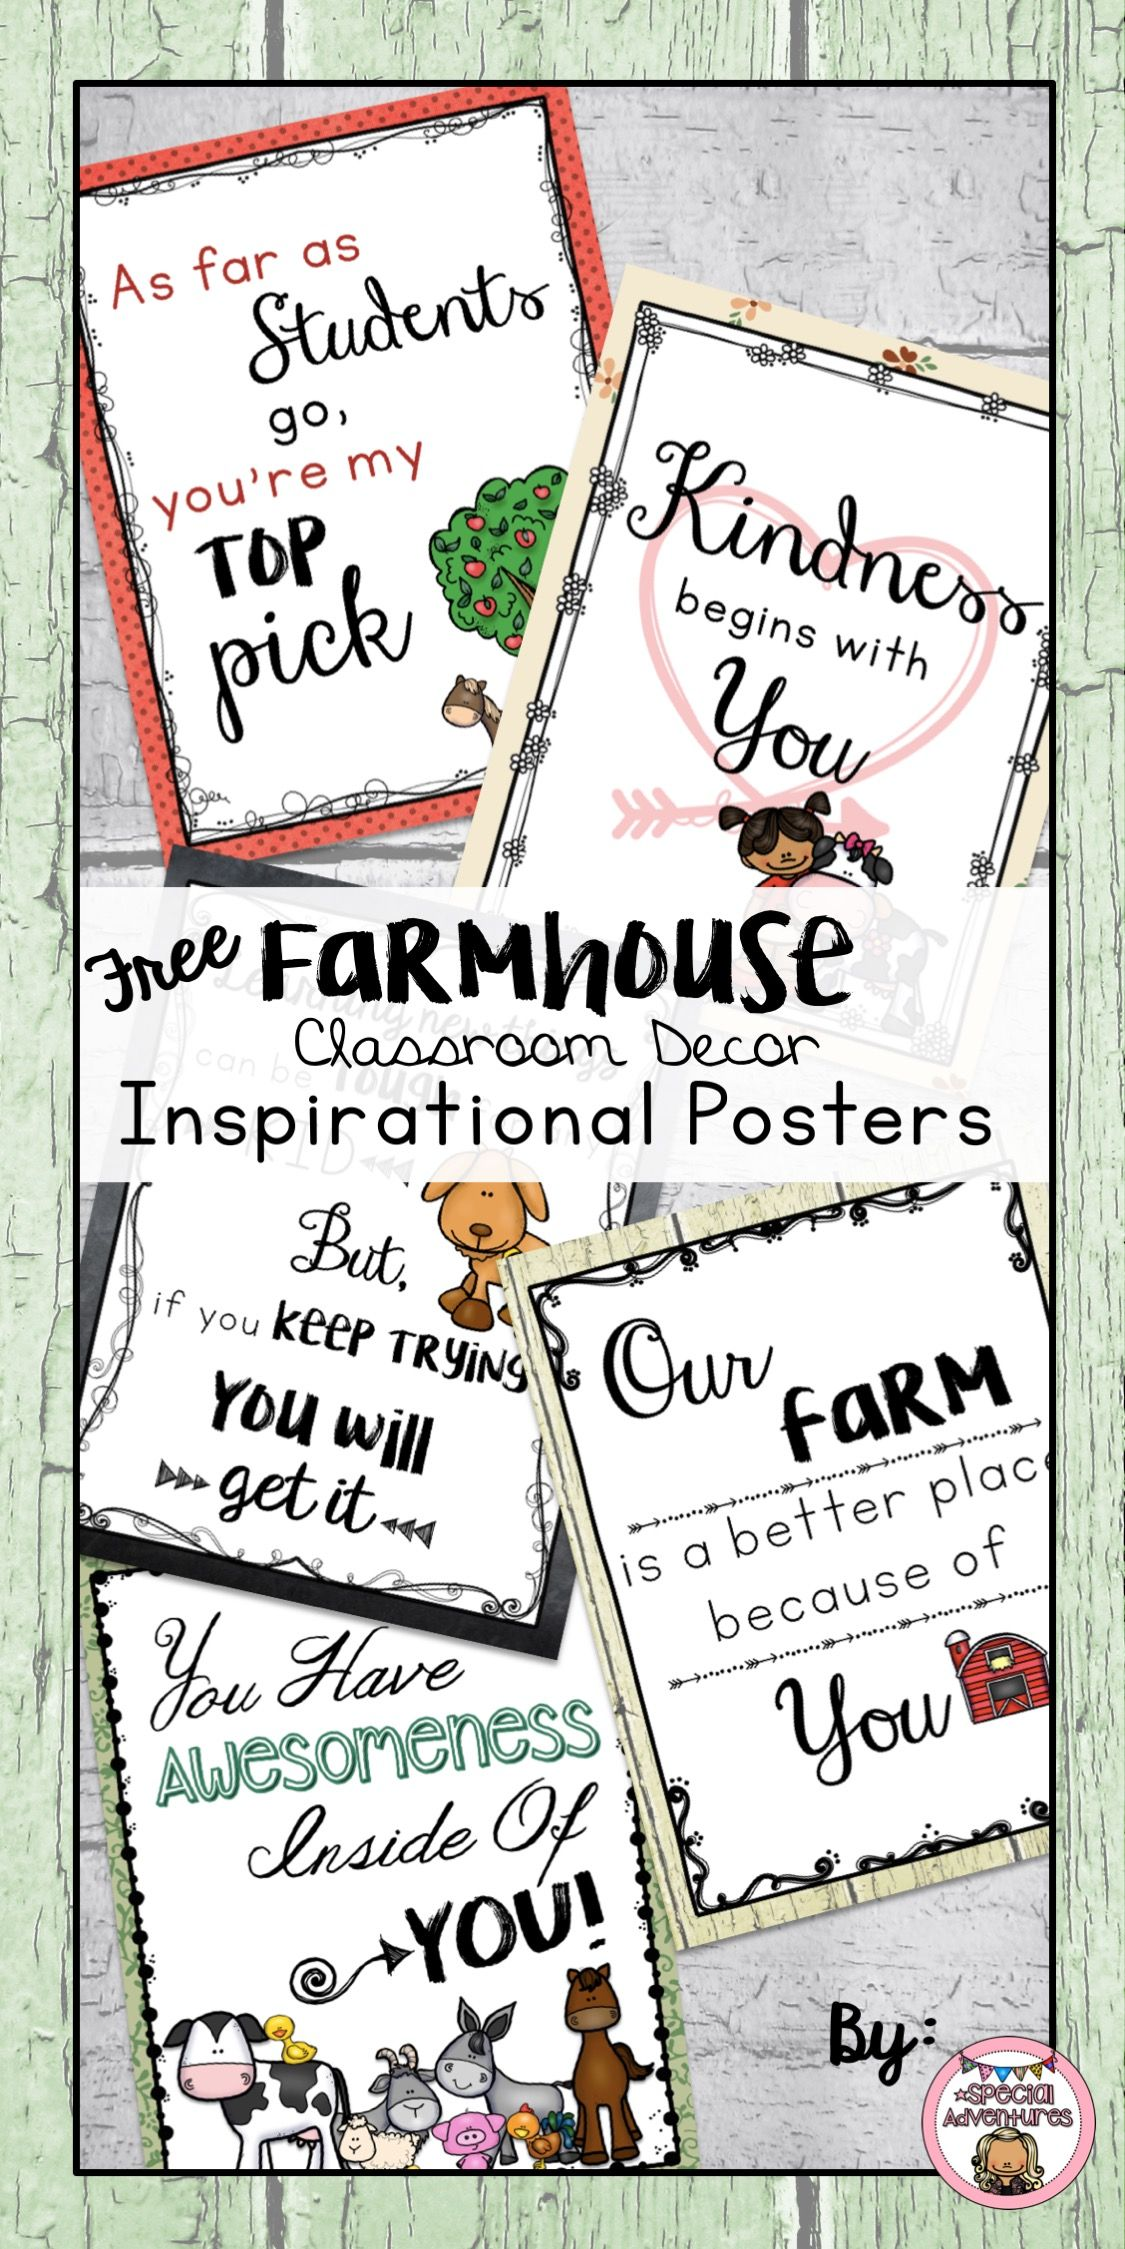 Farmhouse Classroom Decor Inspirational Posters Freebie